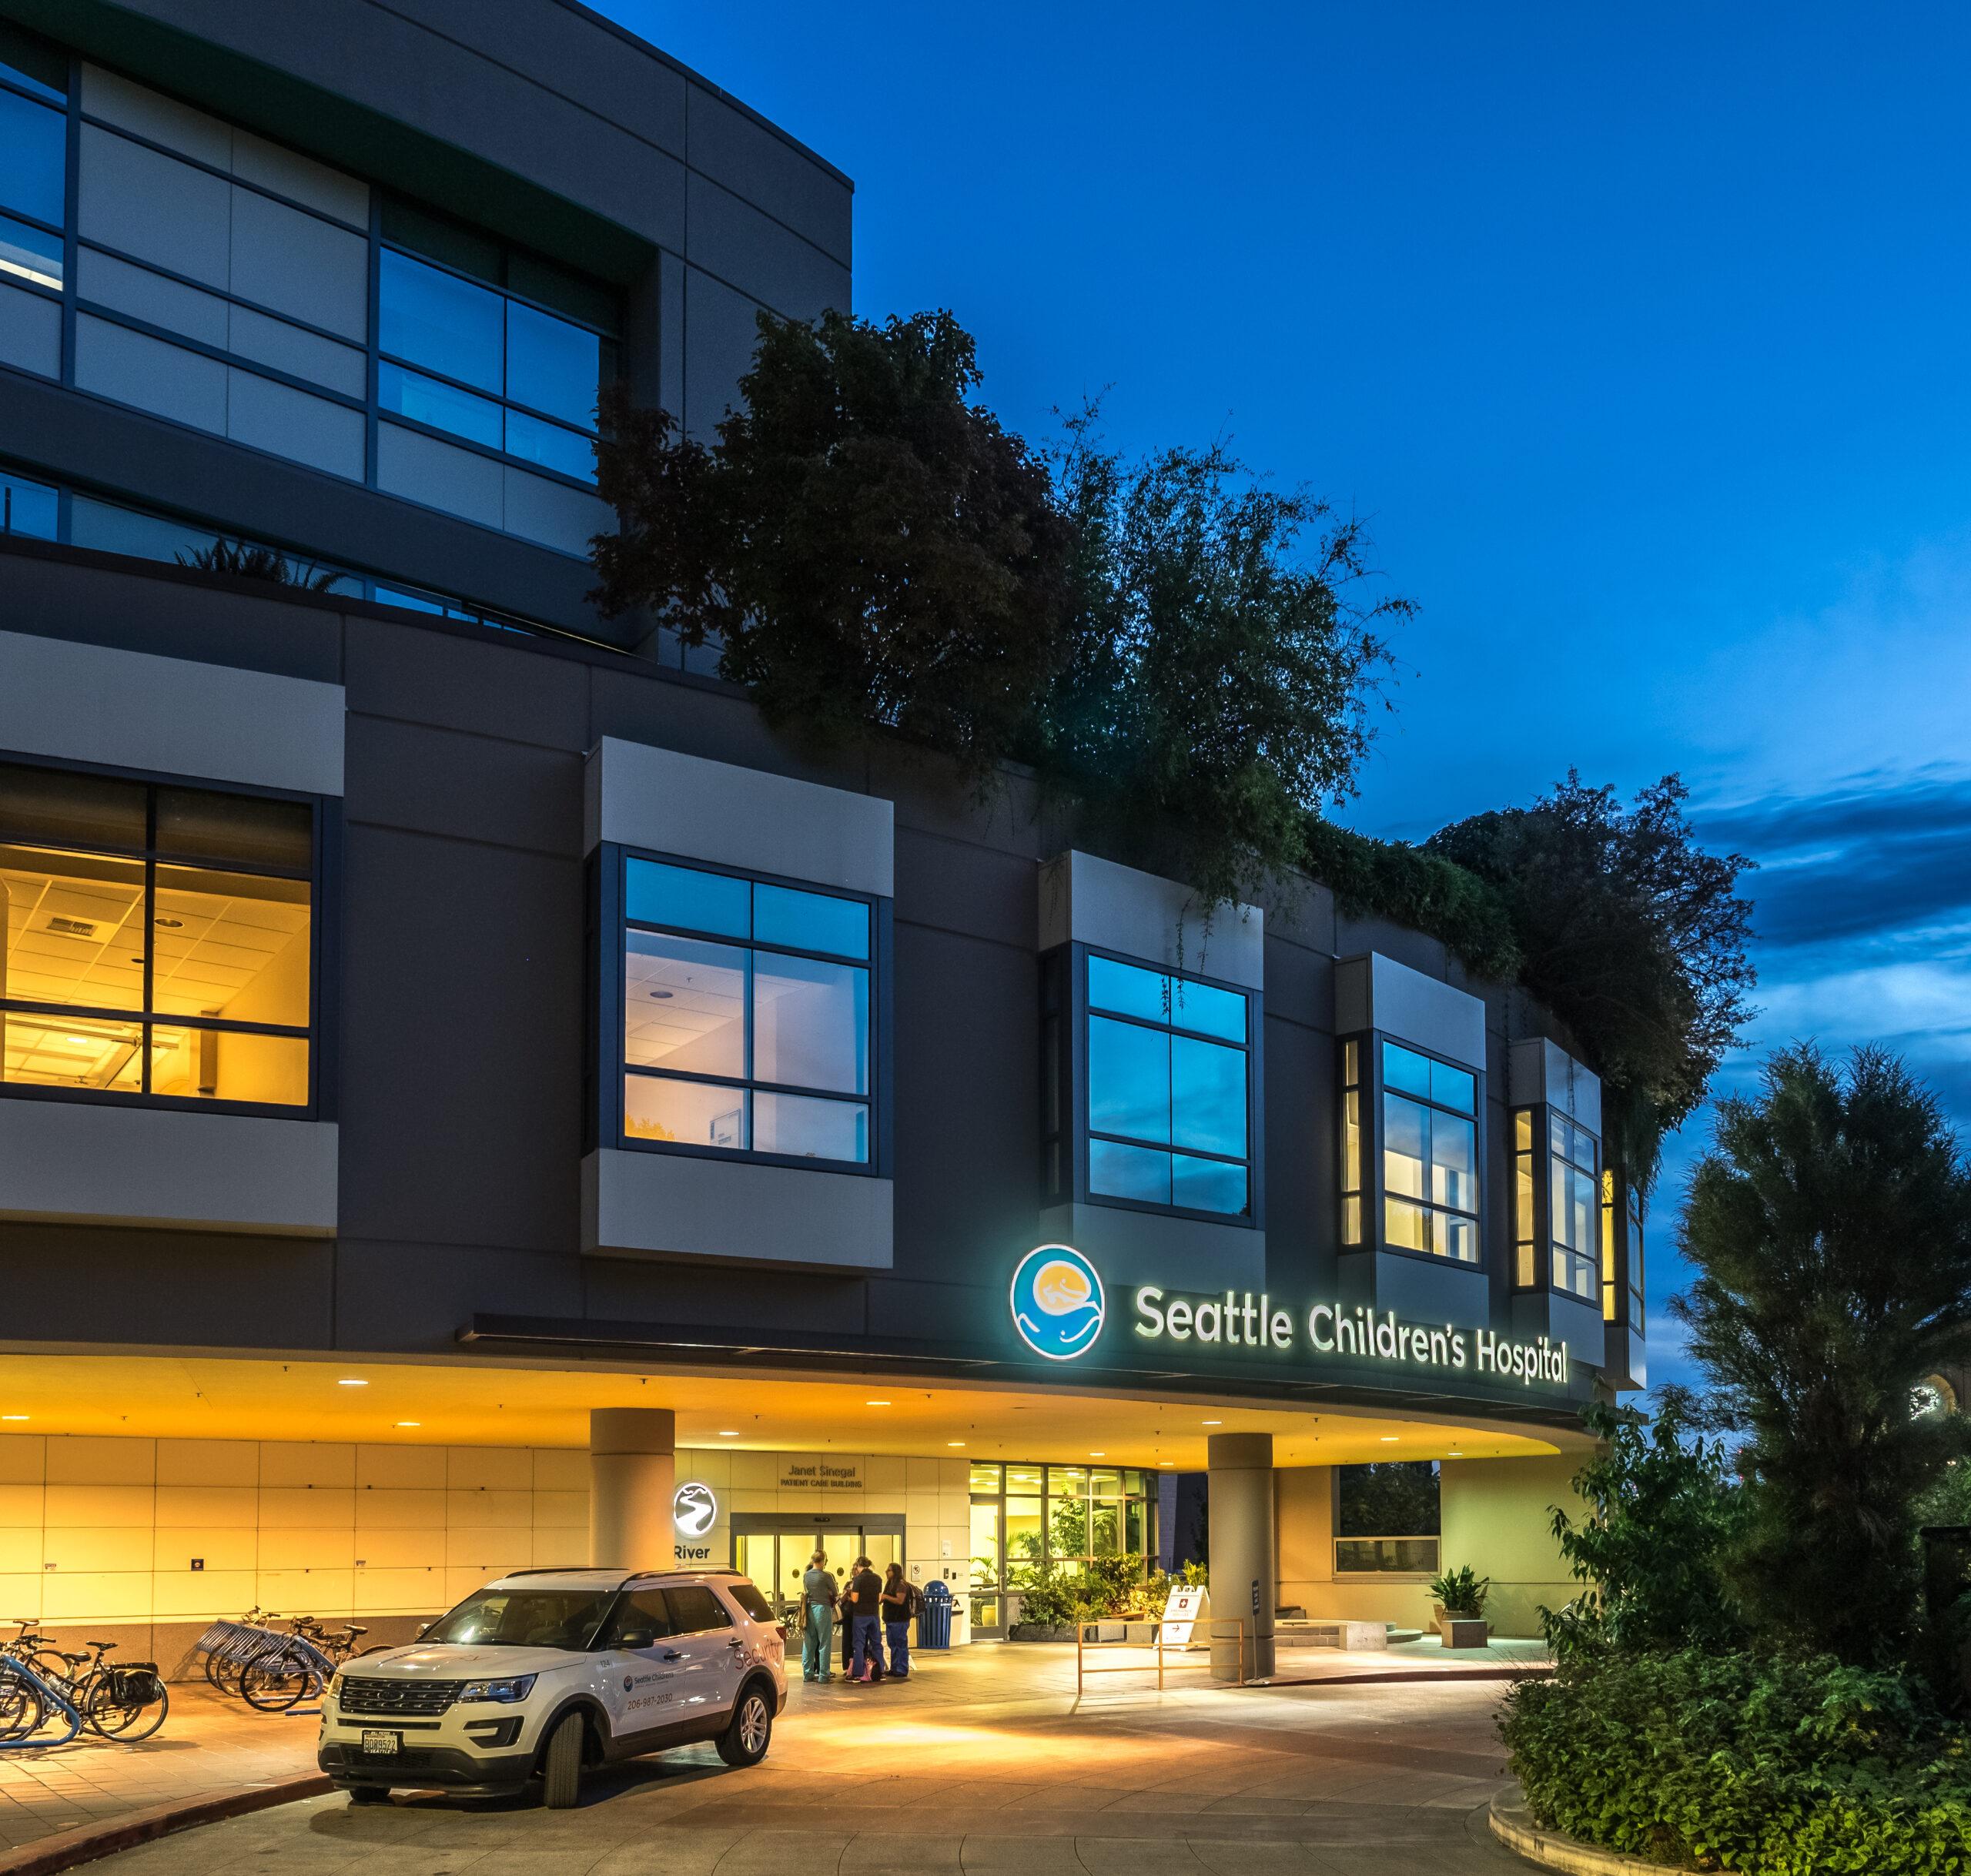 Seattle Children's Hospital Announces Phase 3 Plans